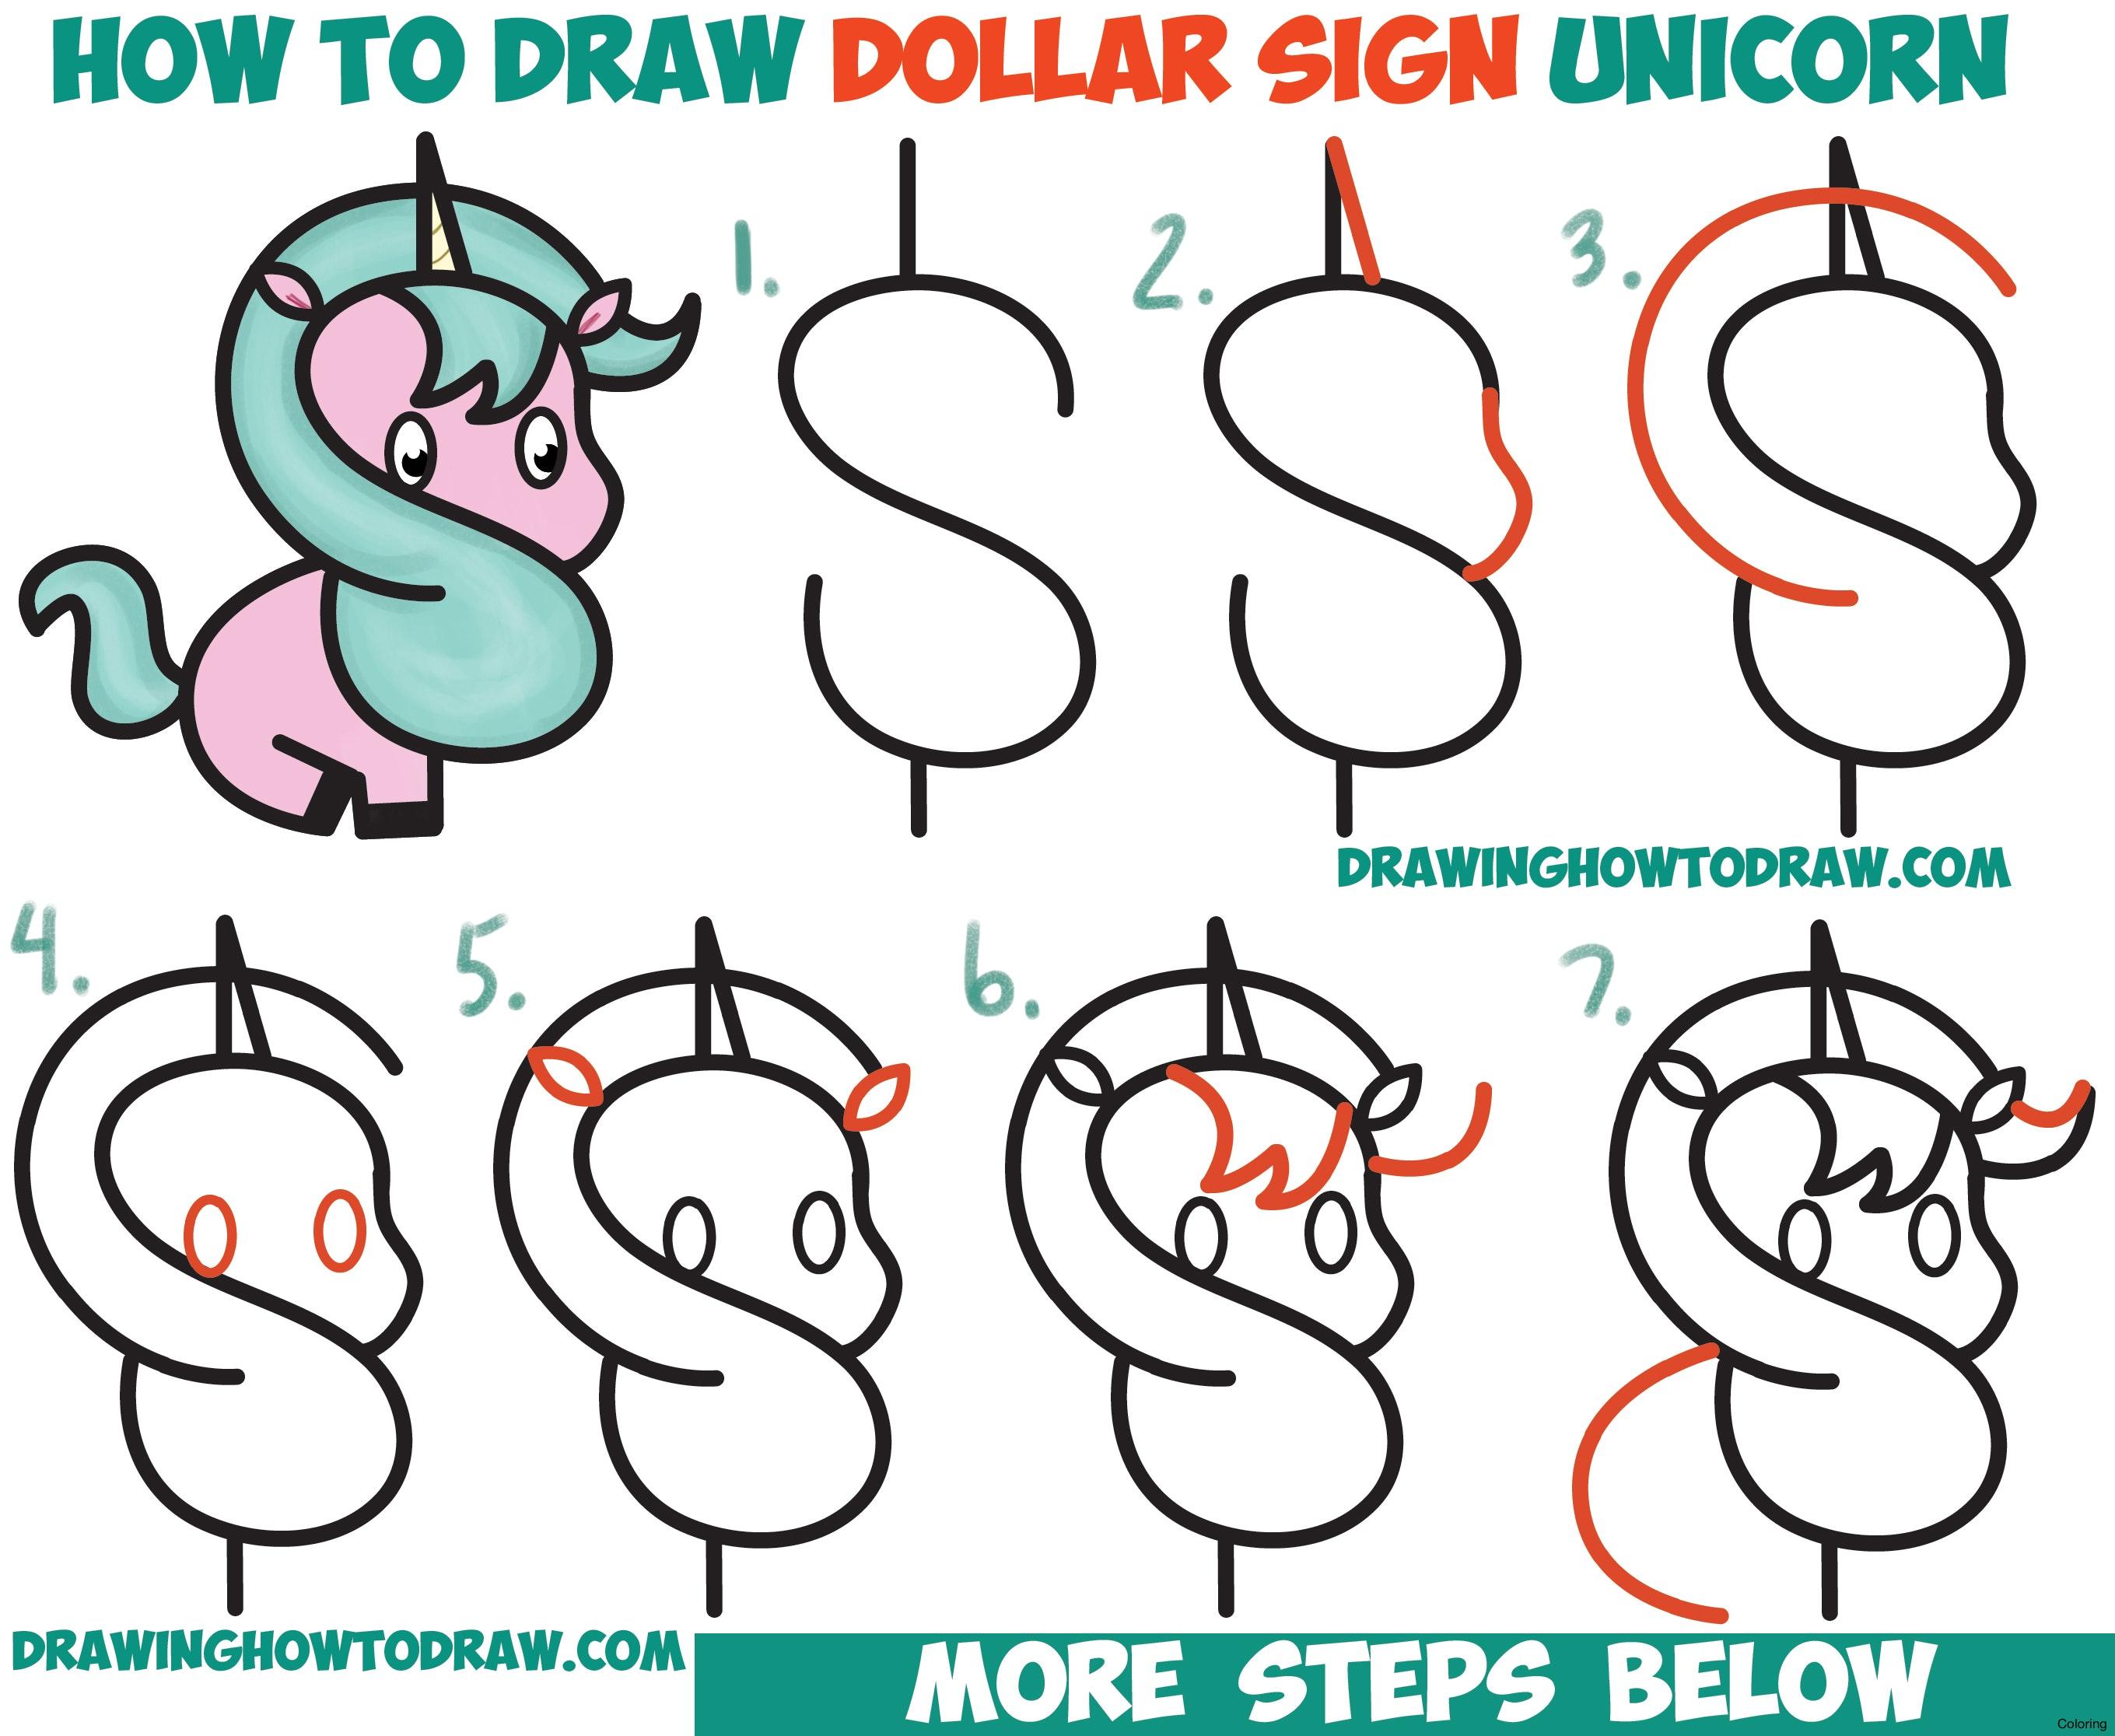 2719x2232 How To Draw Cute Kawaii Chibi Cartoon Unicorn From Dollar Sign